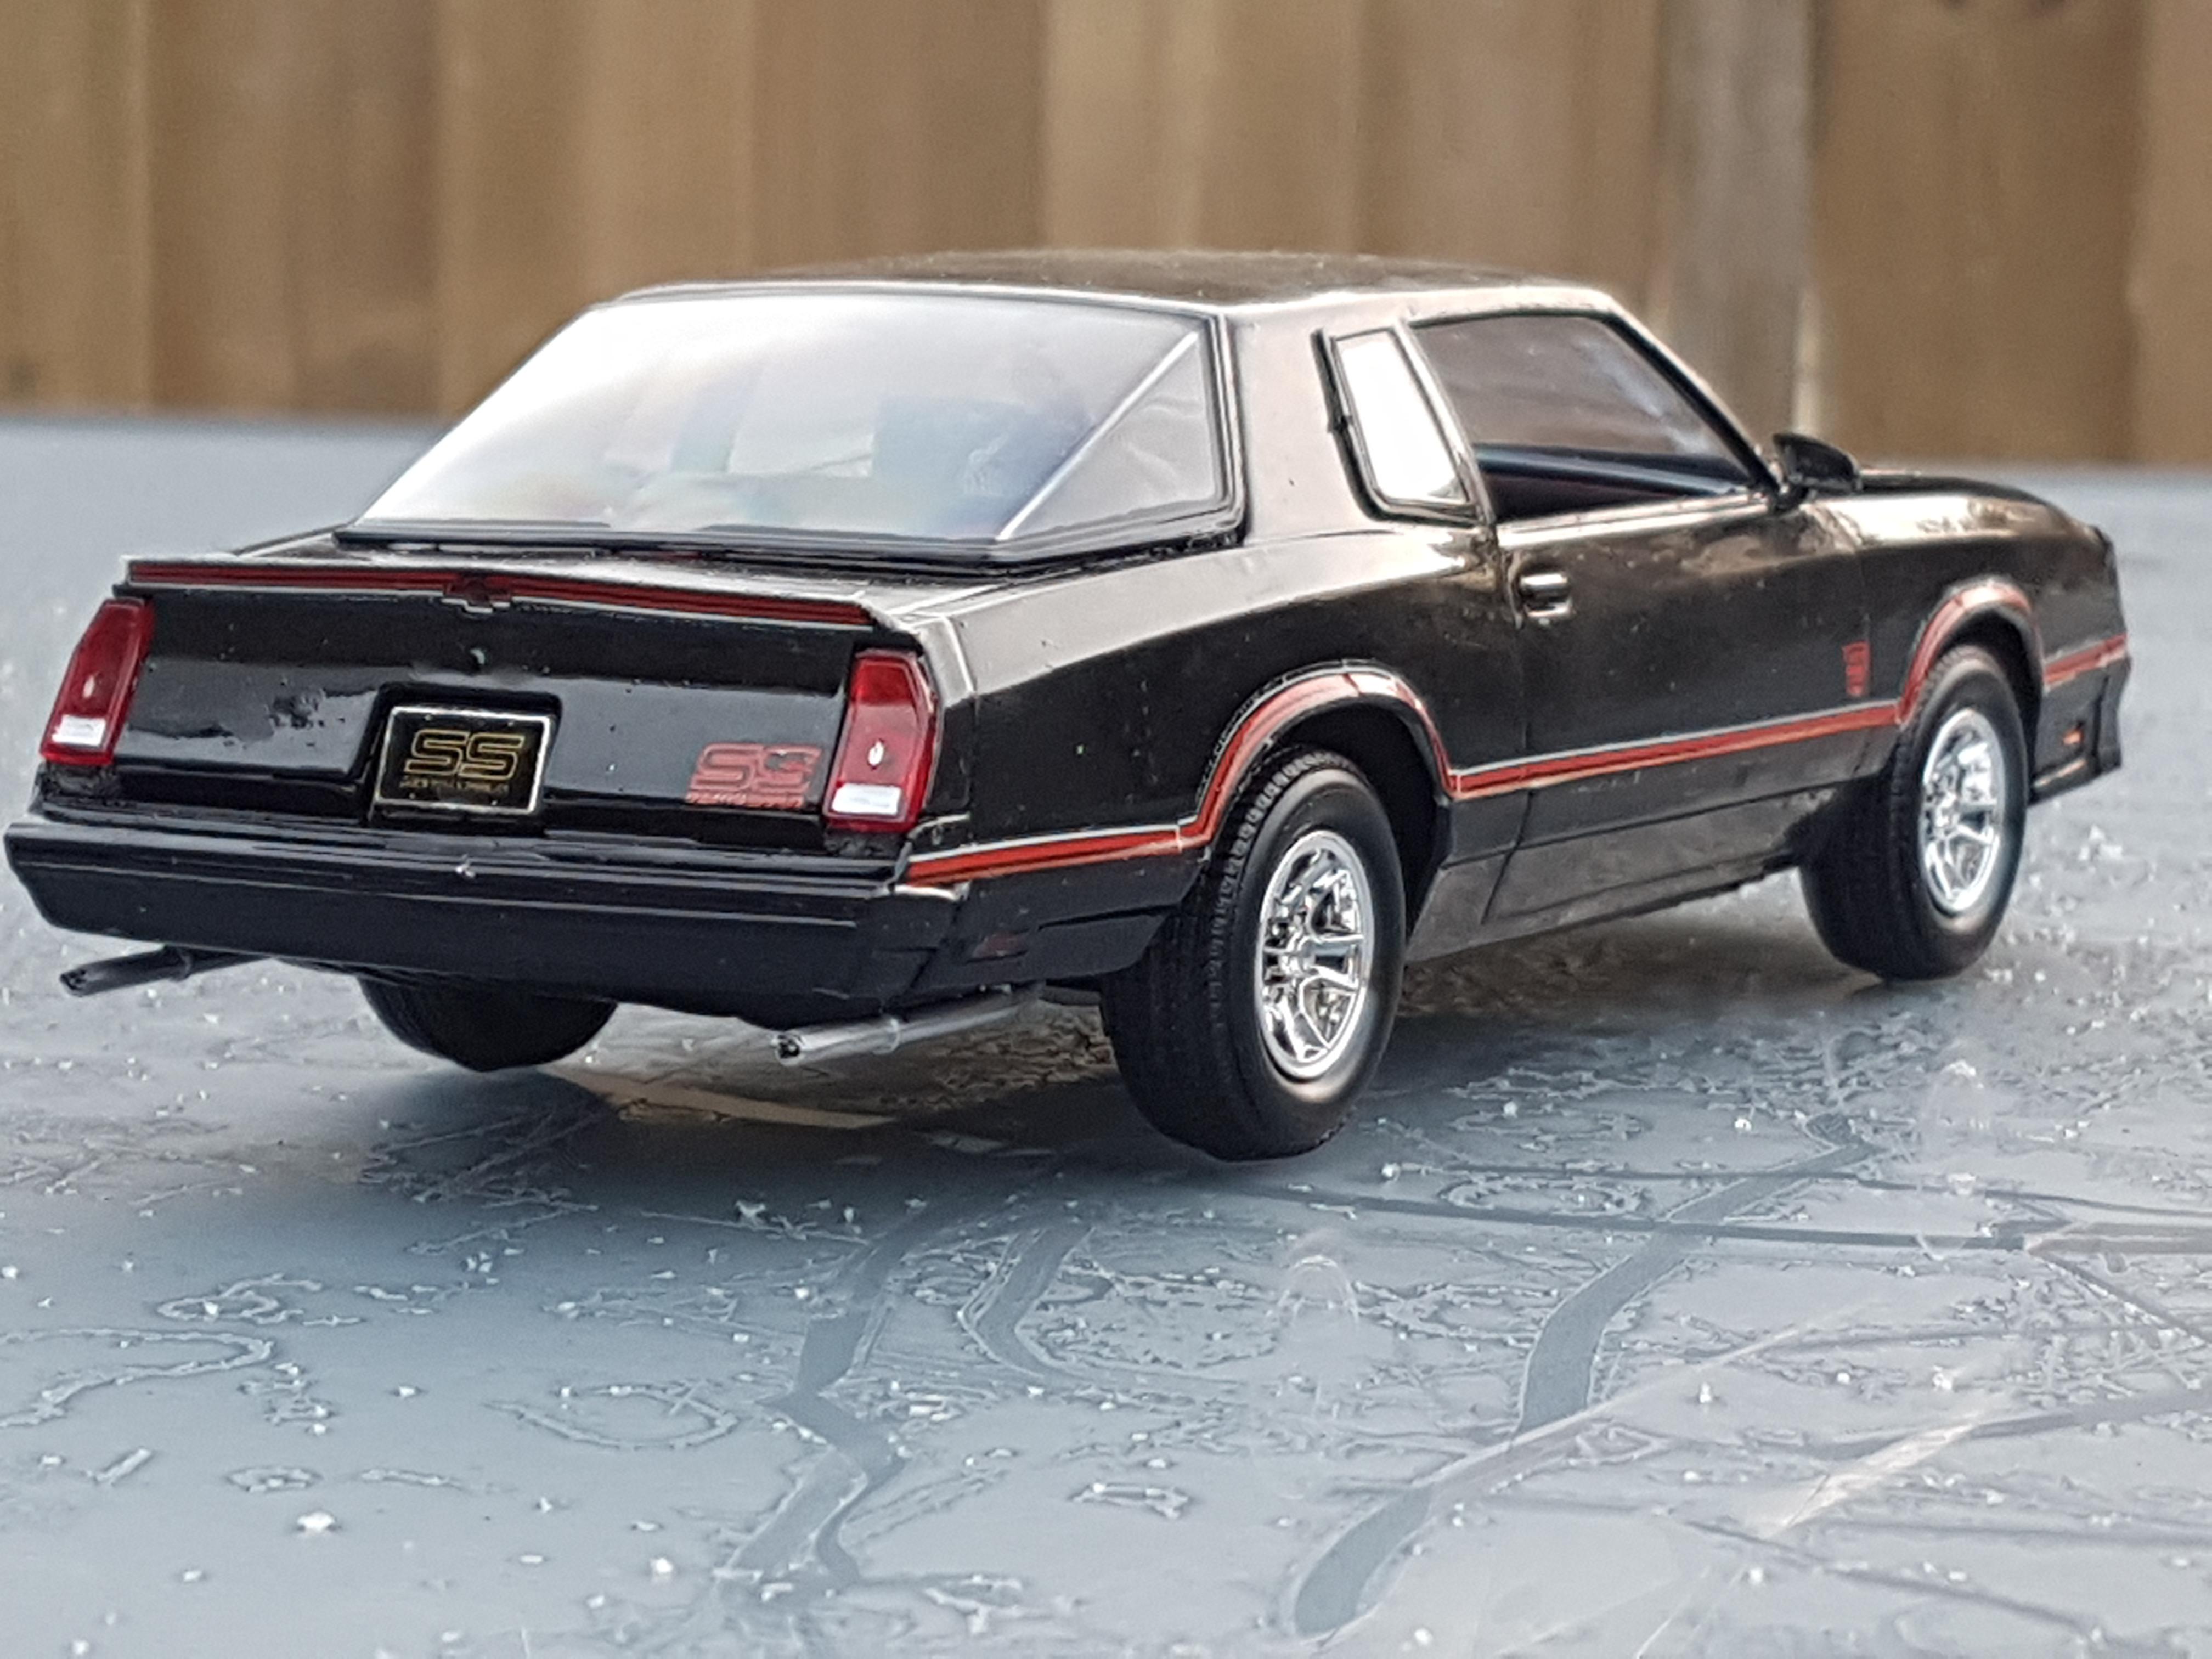 87 Chevrolet Monte Carlo